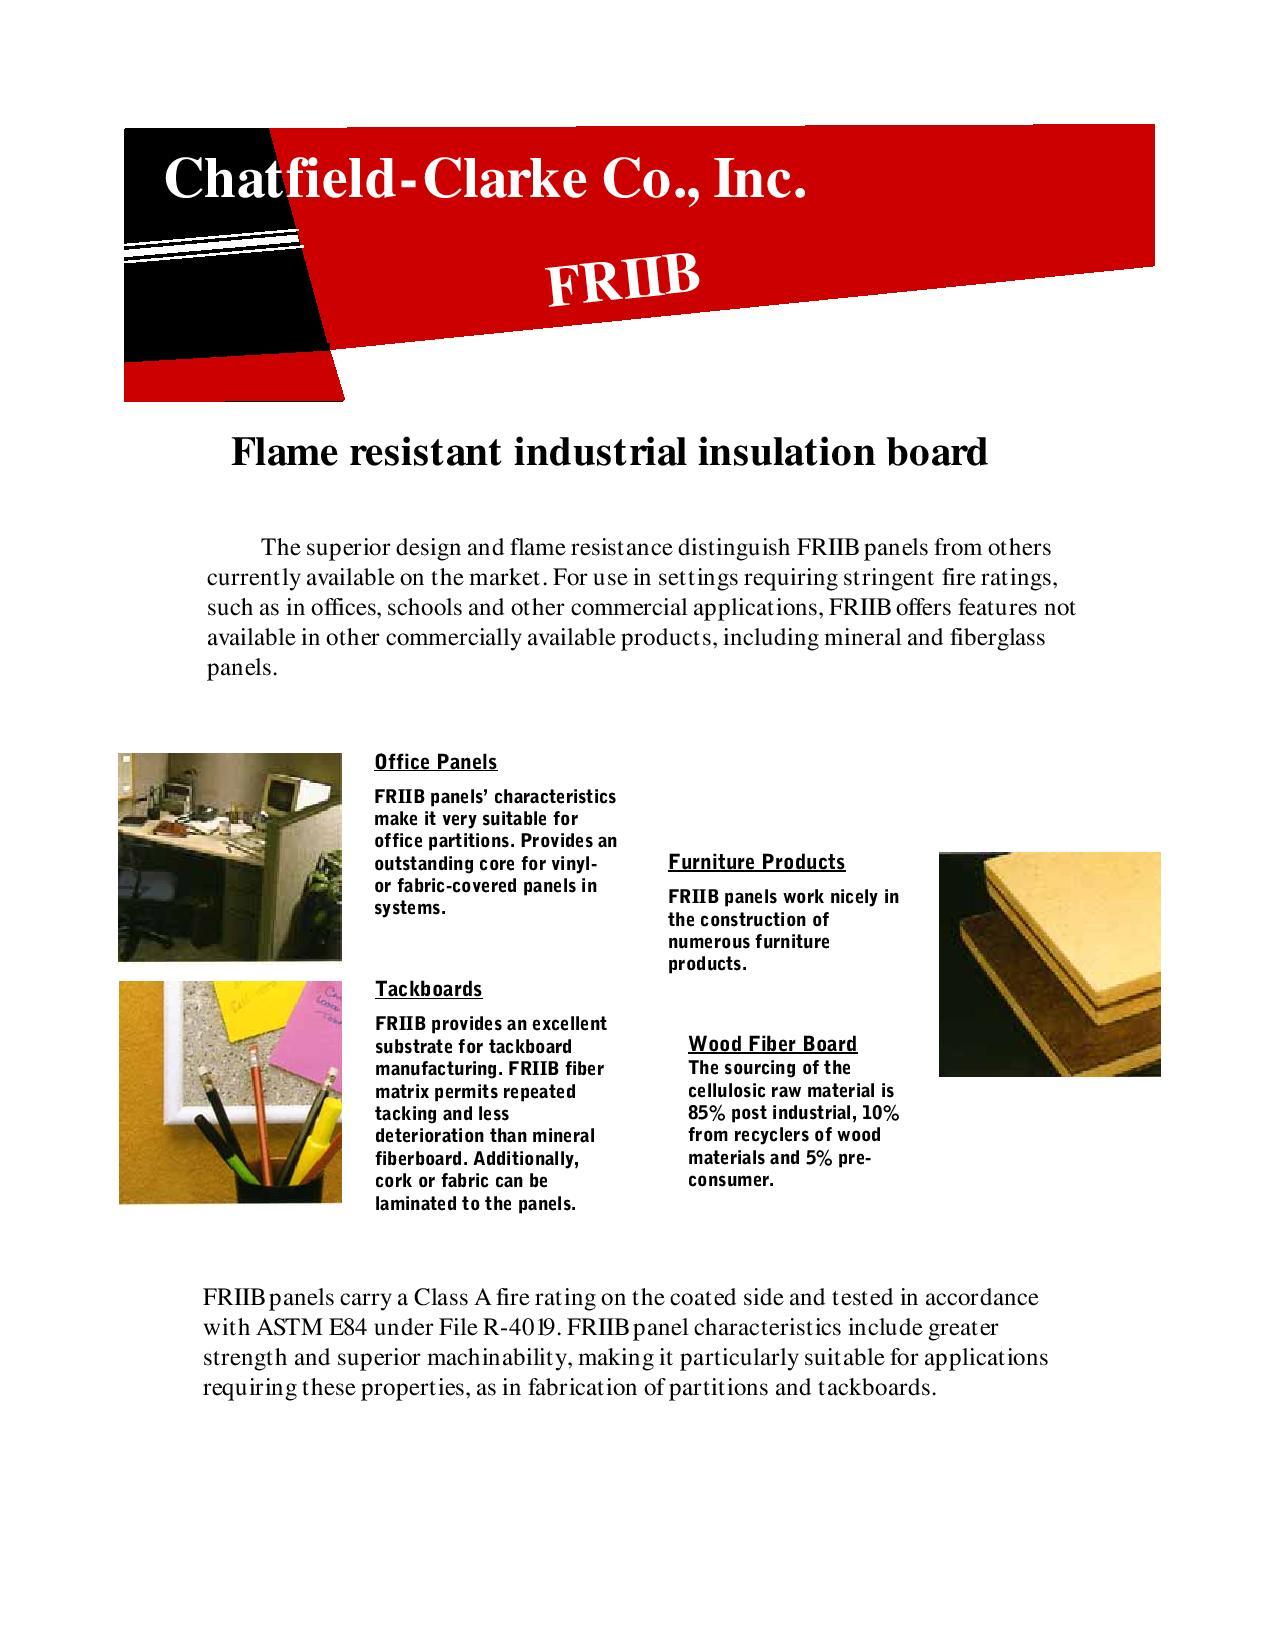 friib-panels.jpg